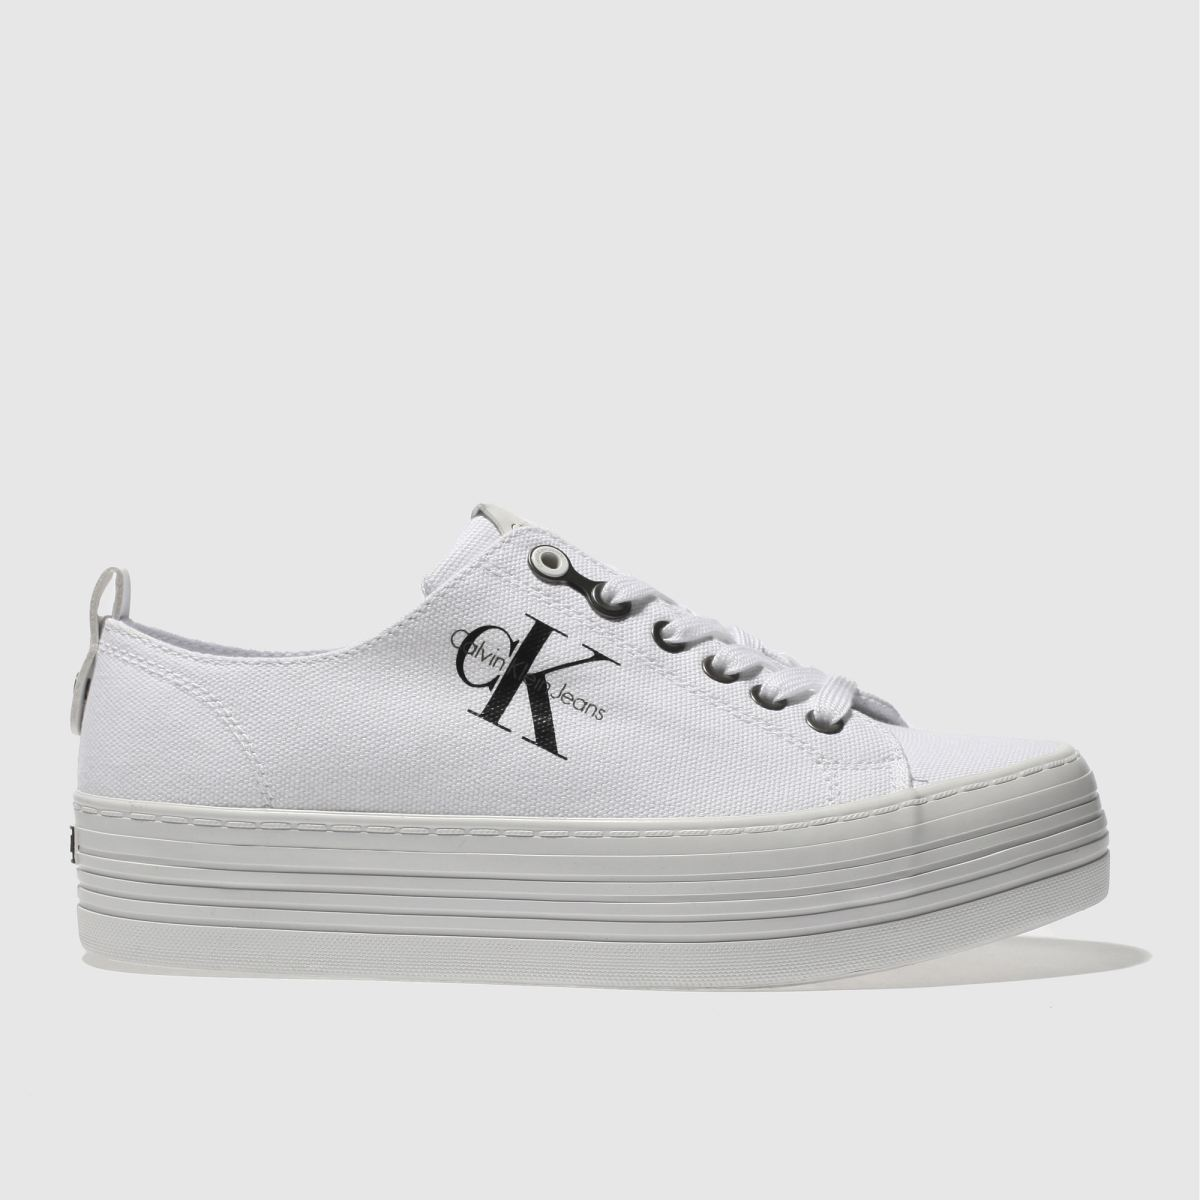 Calvin Klein White & Black Jeans Zolah Canvas Trainers